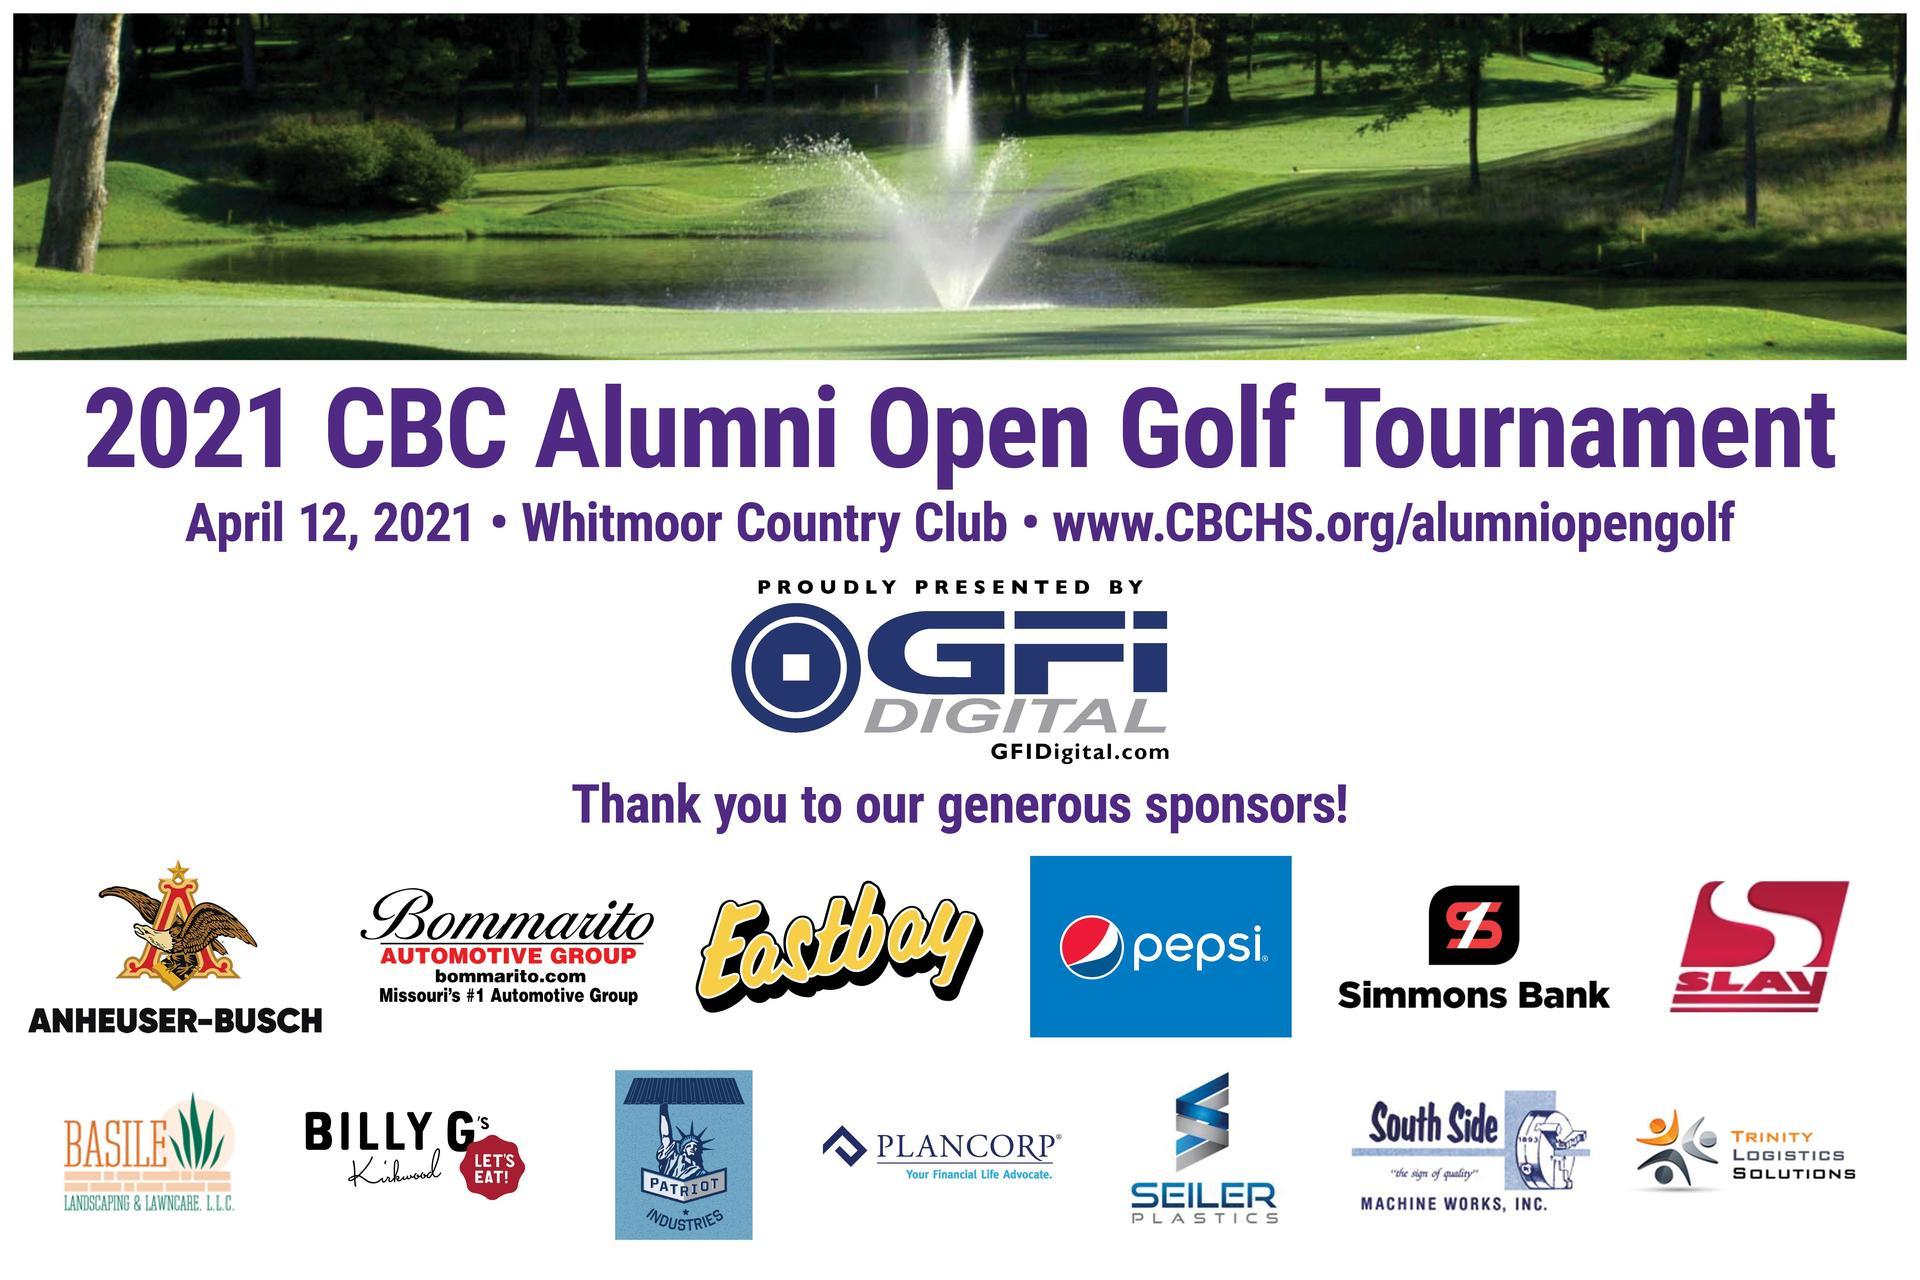 2021 CBC Alumni Open Golf Tournament